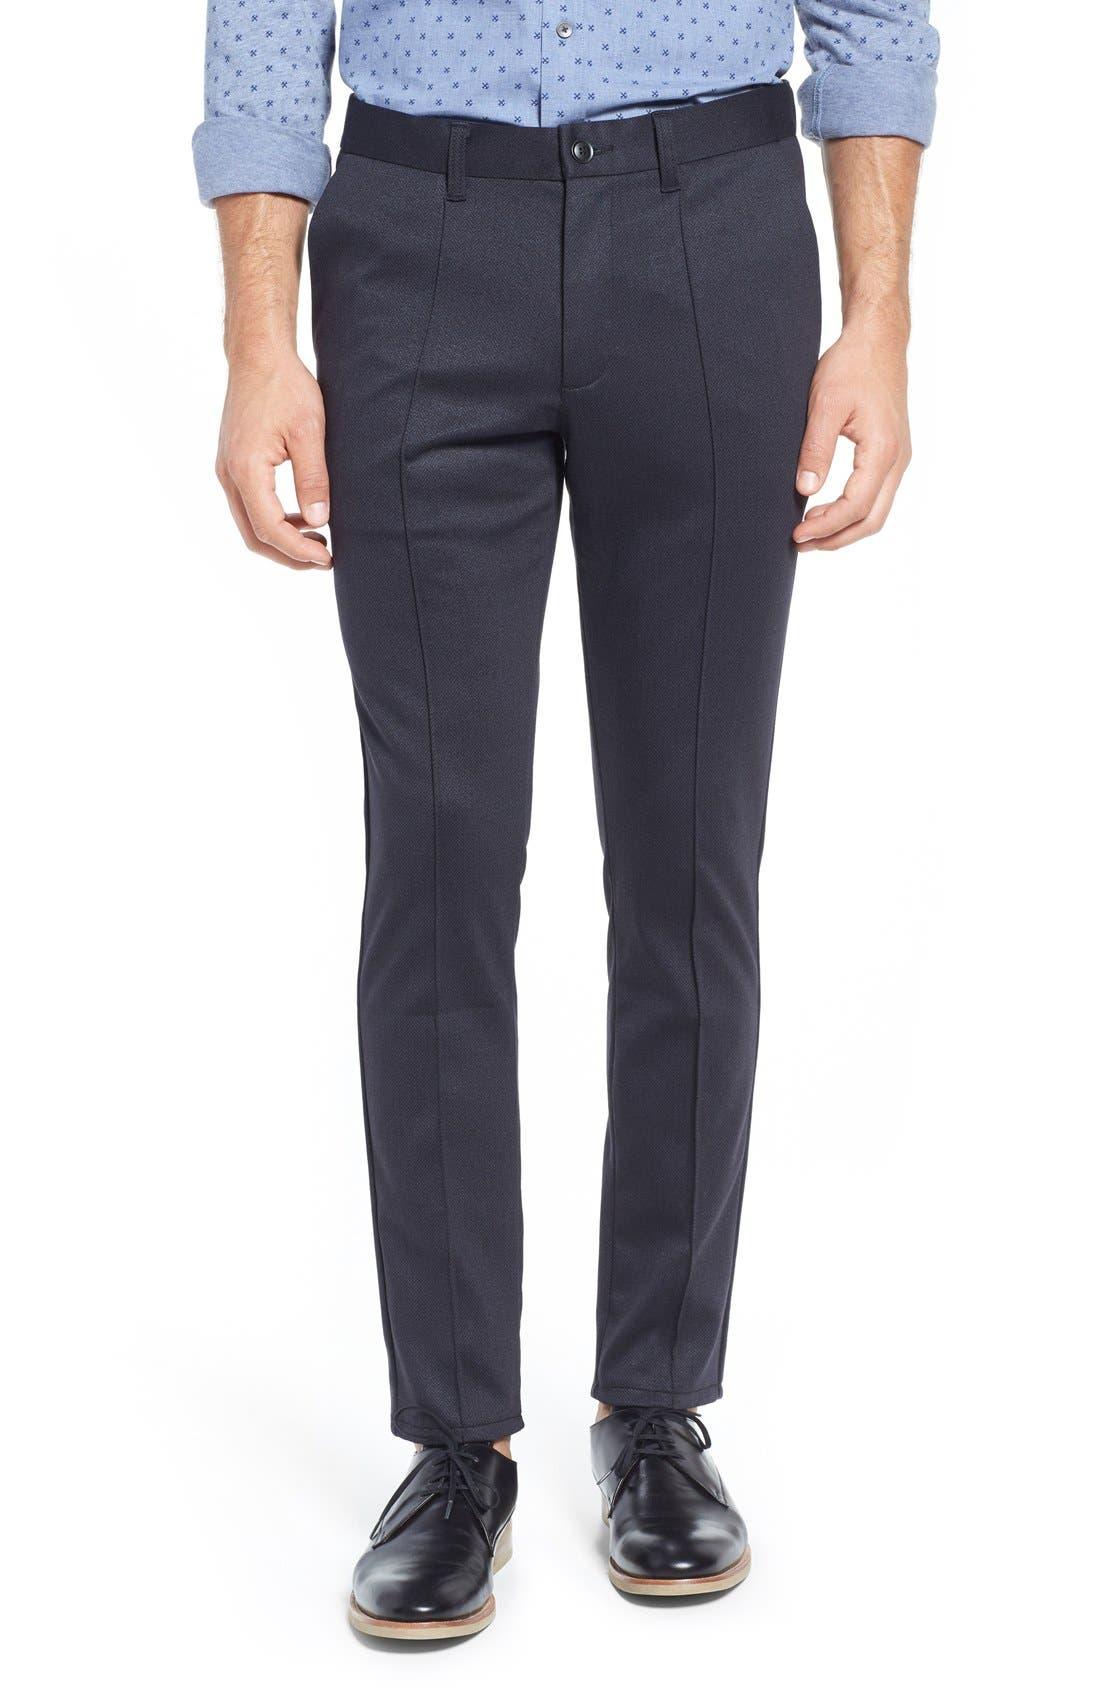 Prospect Herringbone Slim Fit Trousers,                             Main thumbnail 1, color,                             001